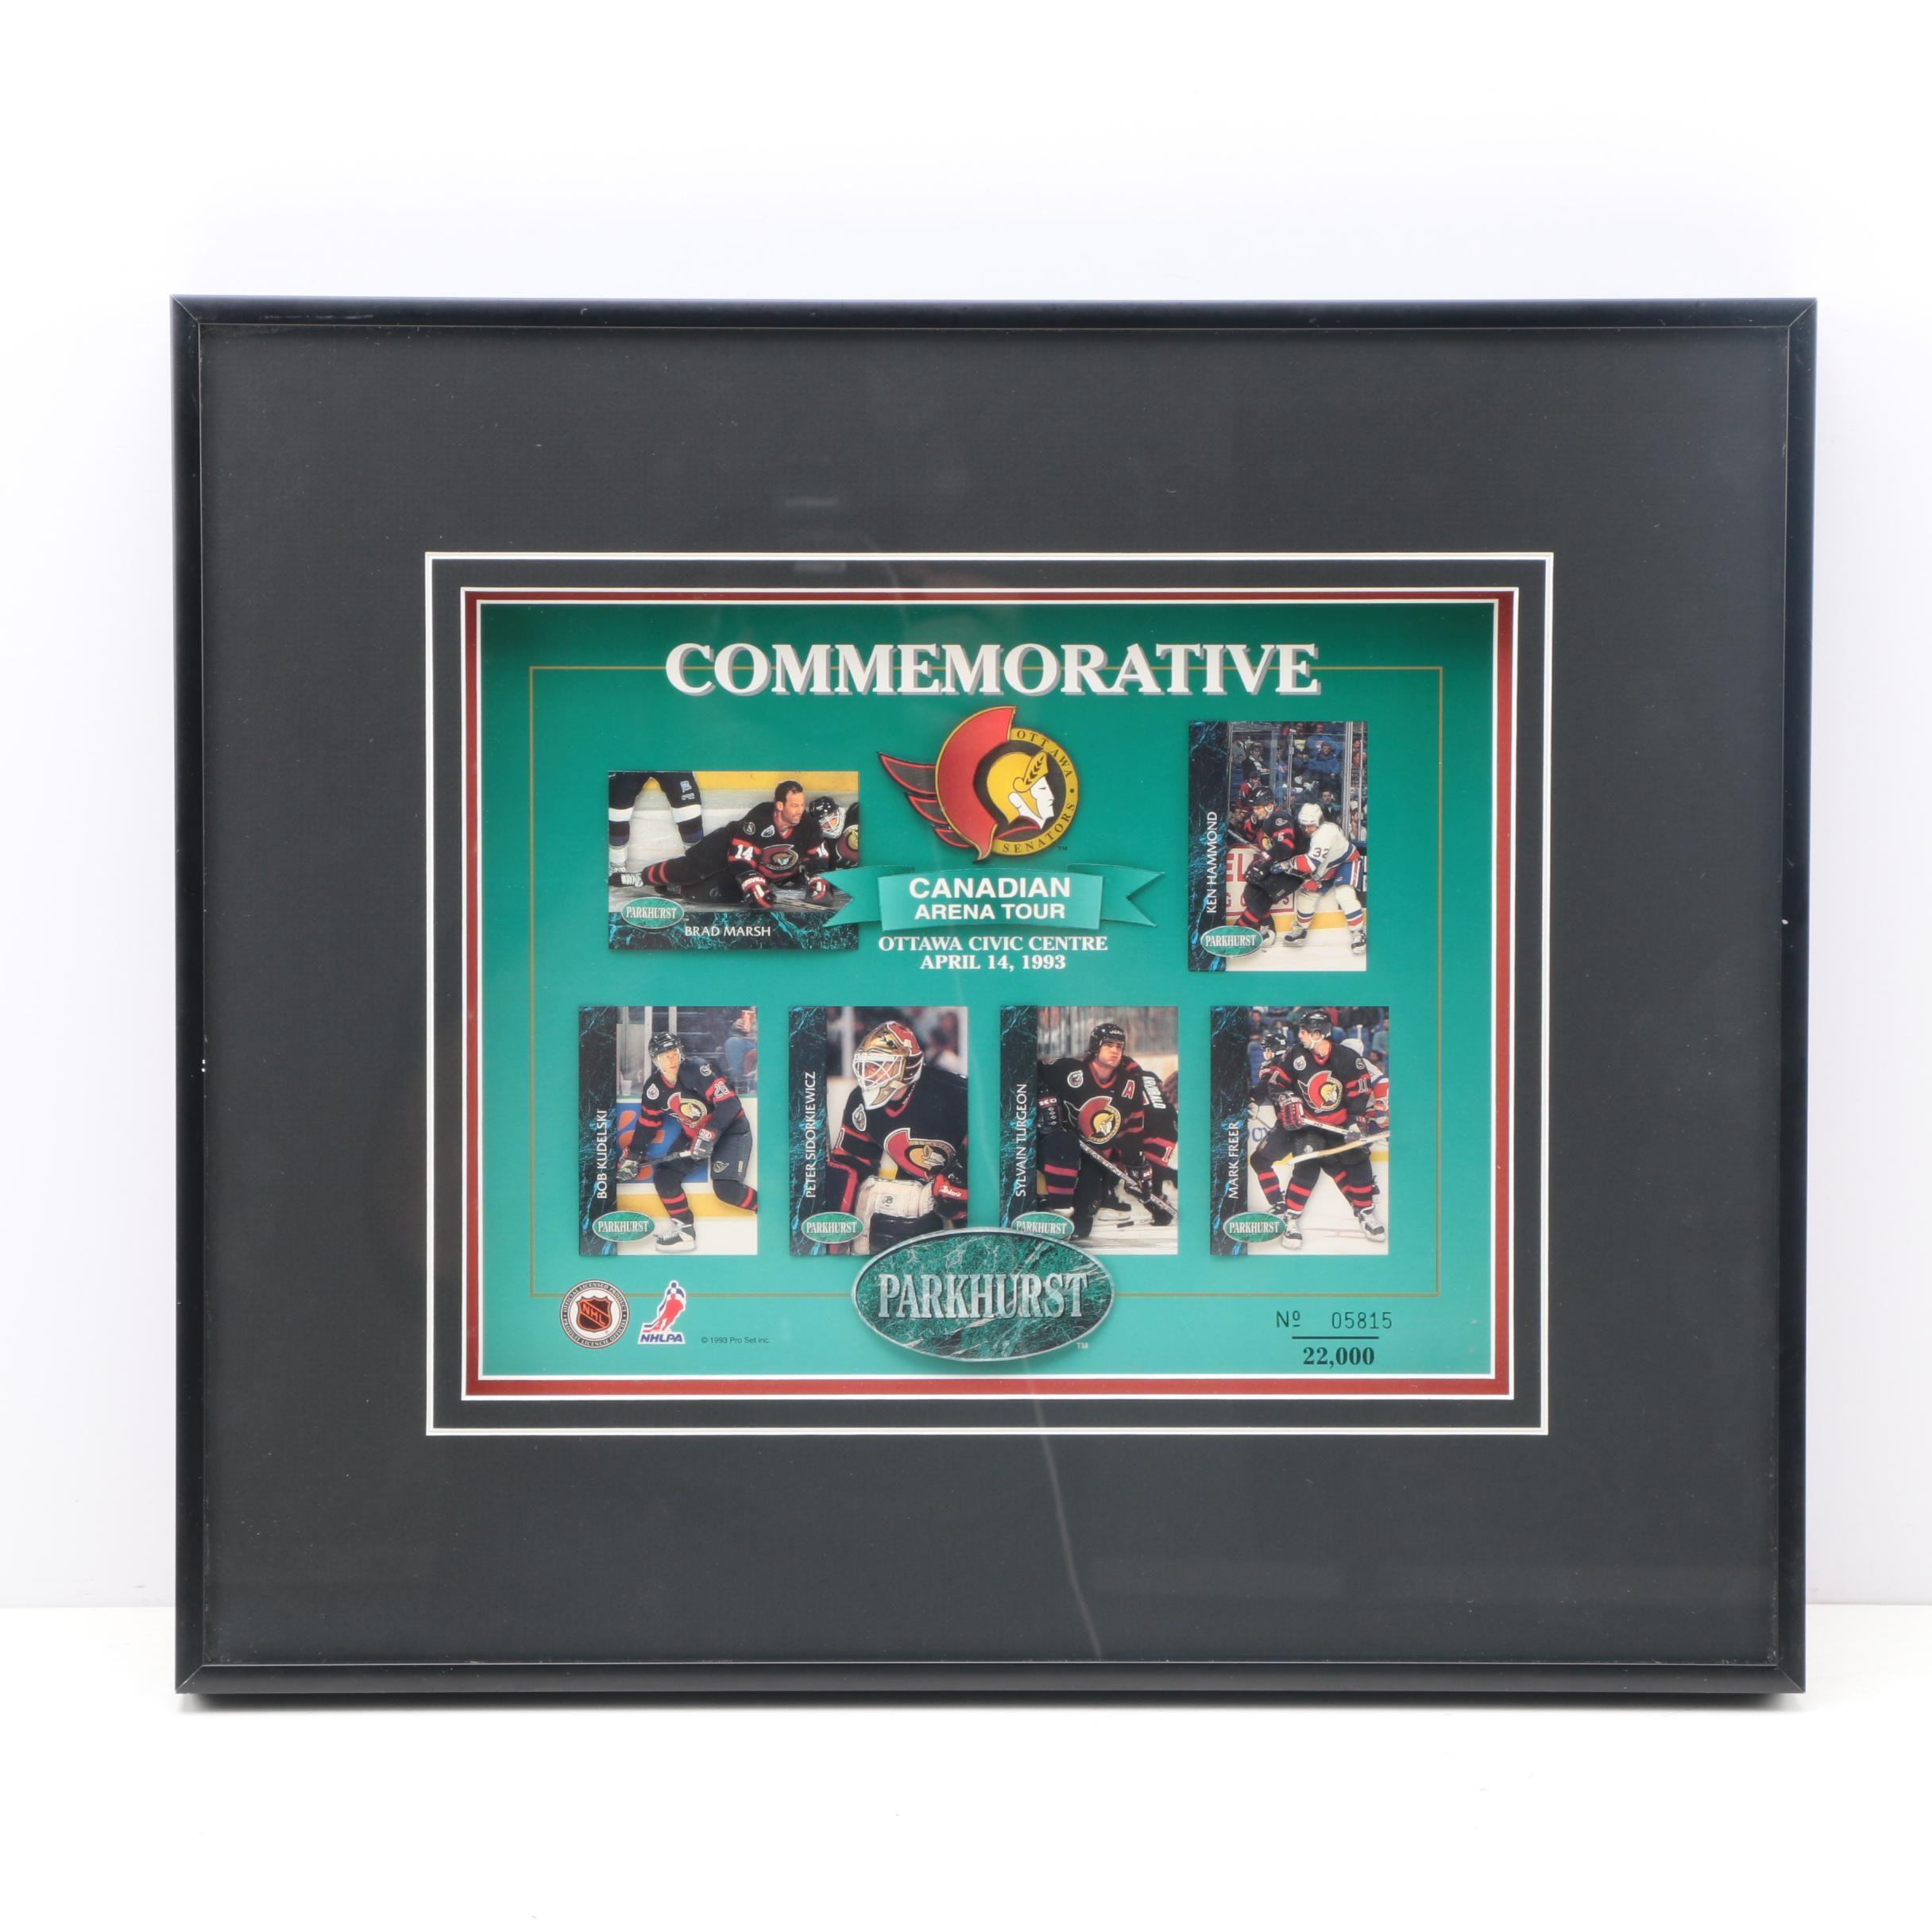 Limited Edition Offset Lithograph Parkhurst Commemorative Ottawa Senators